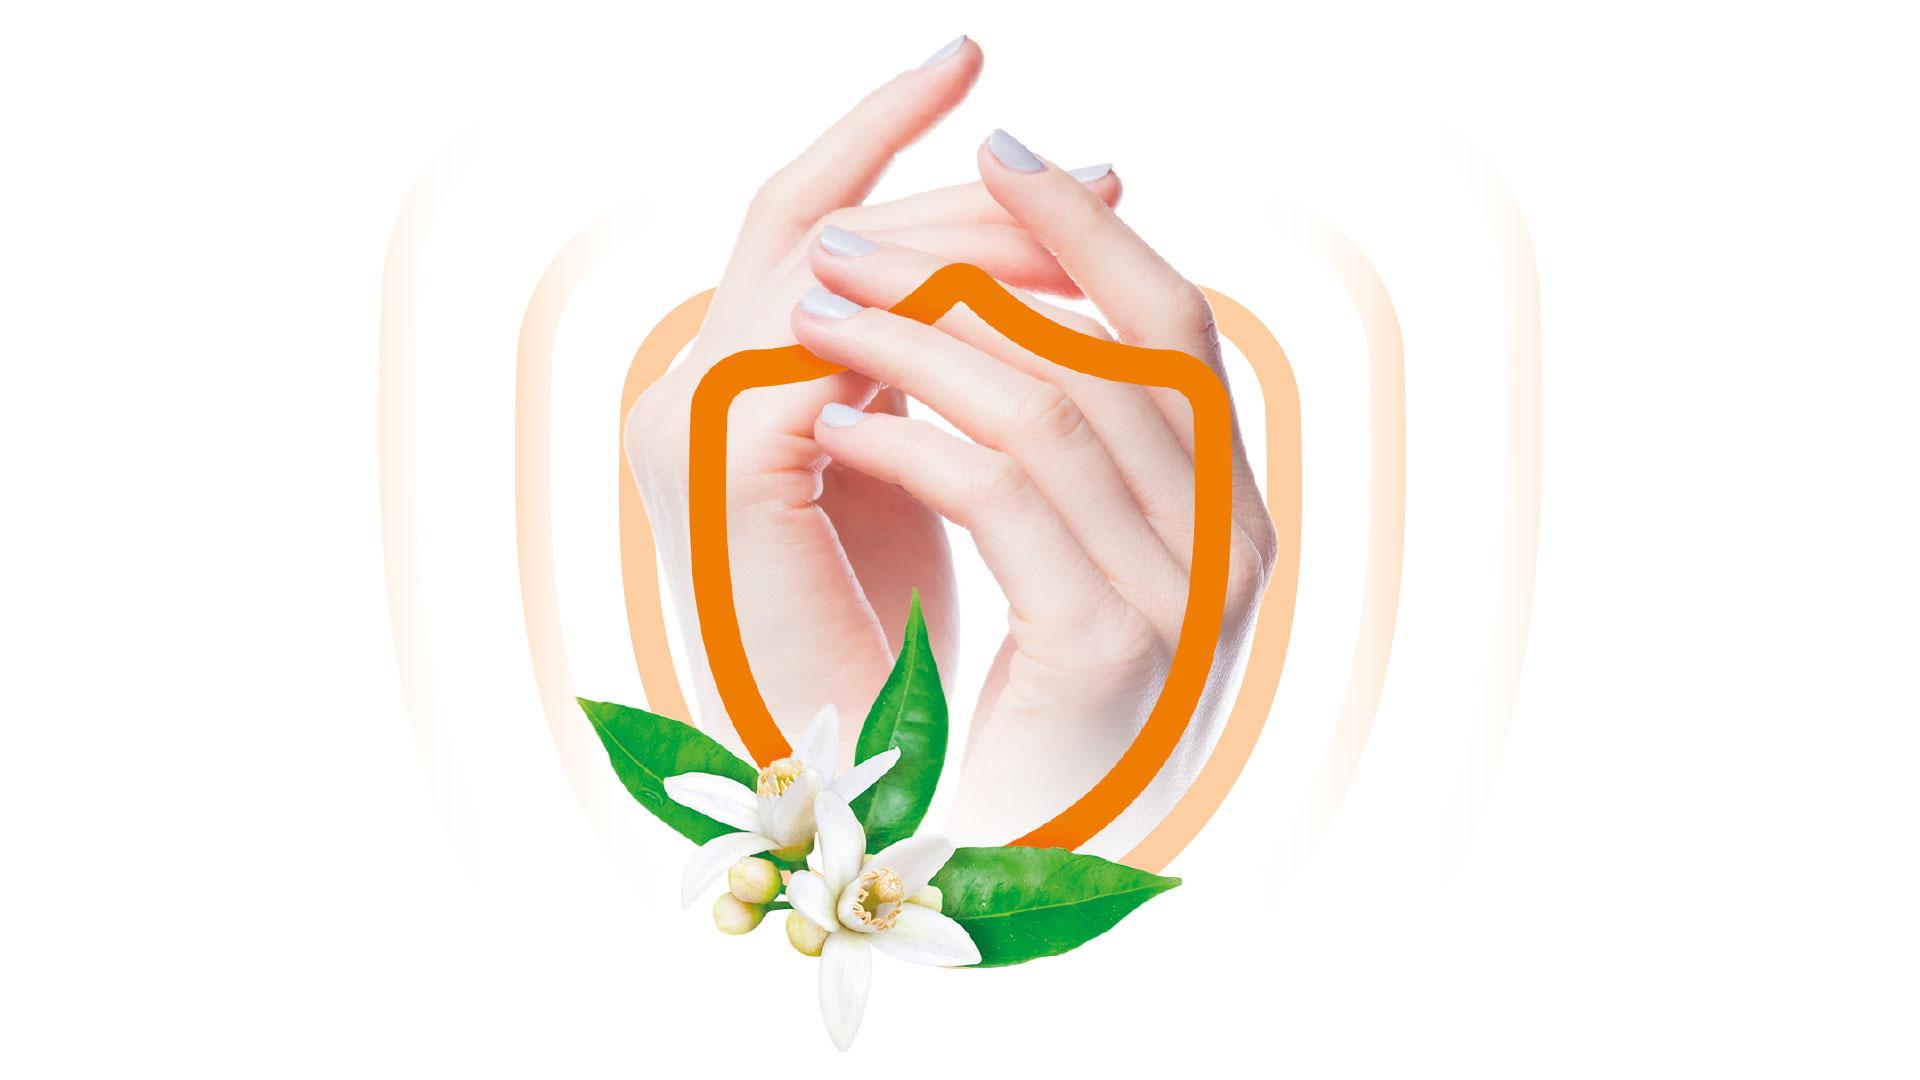 gel-igienizzante-mani-sanapur-banner